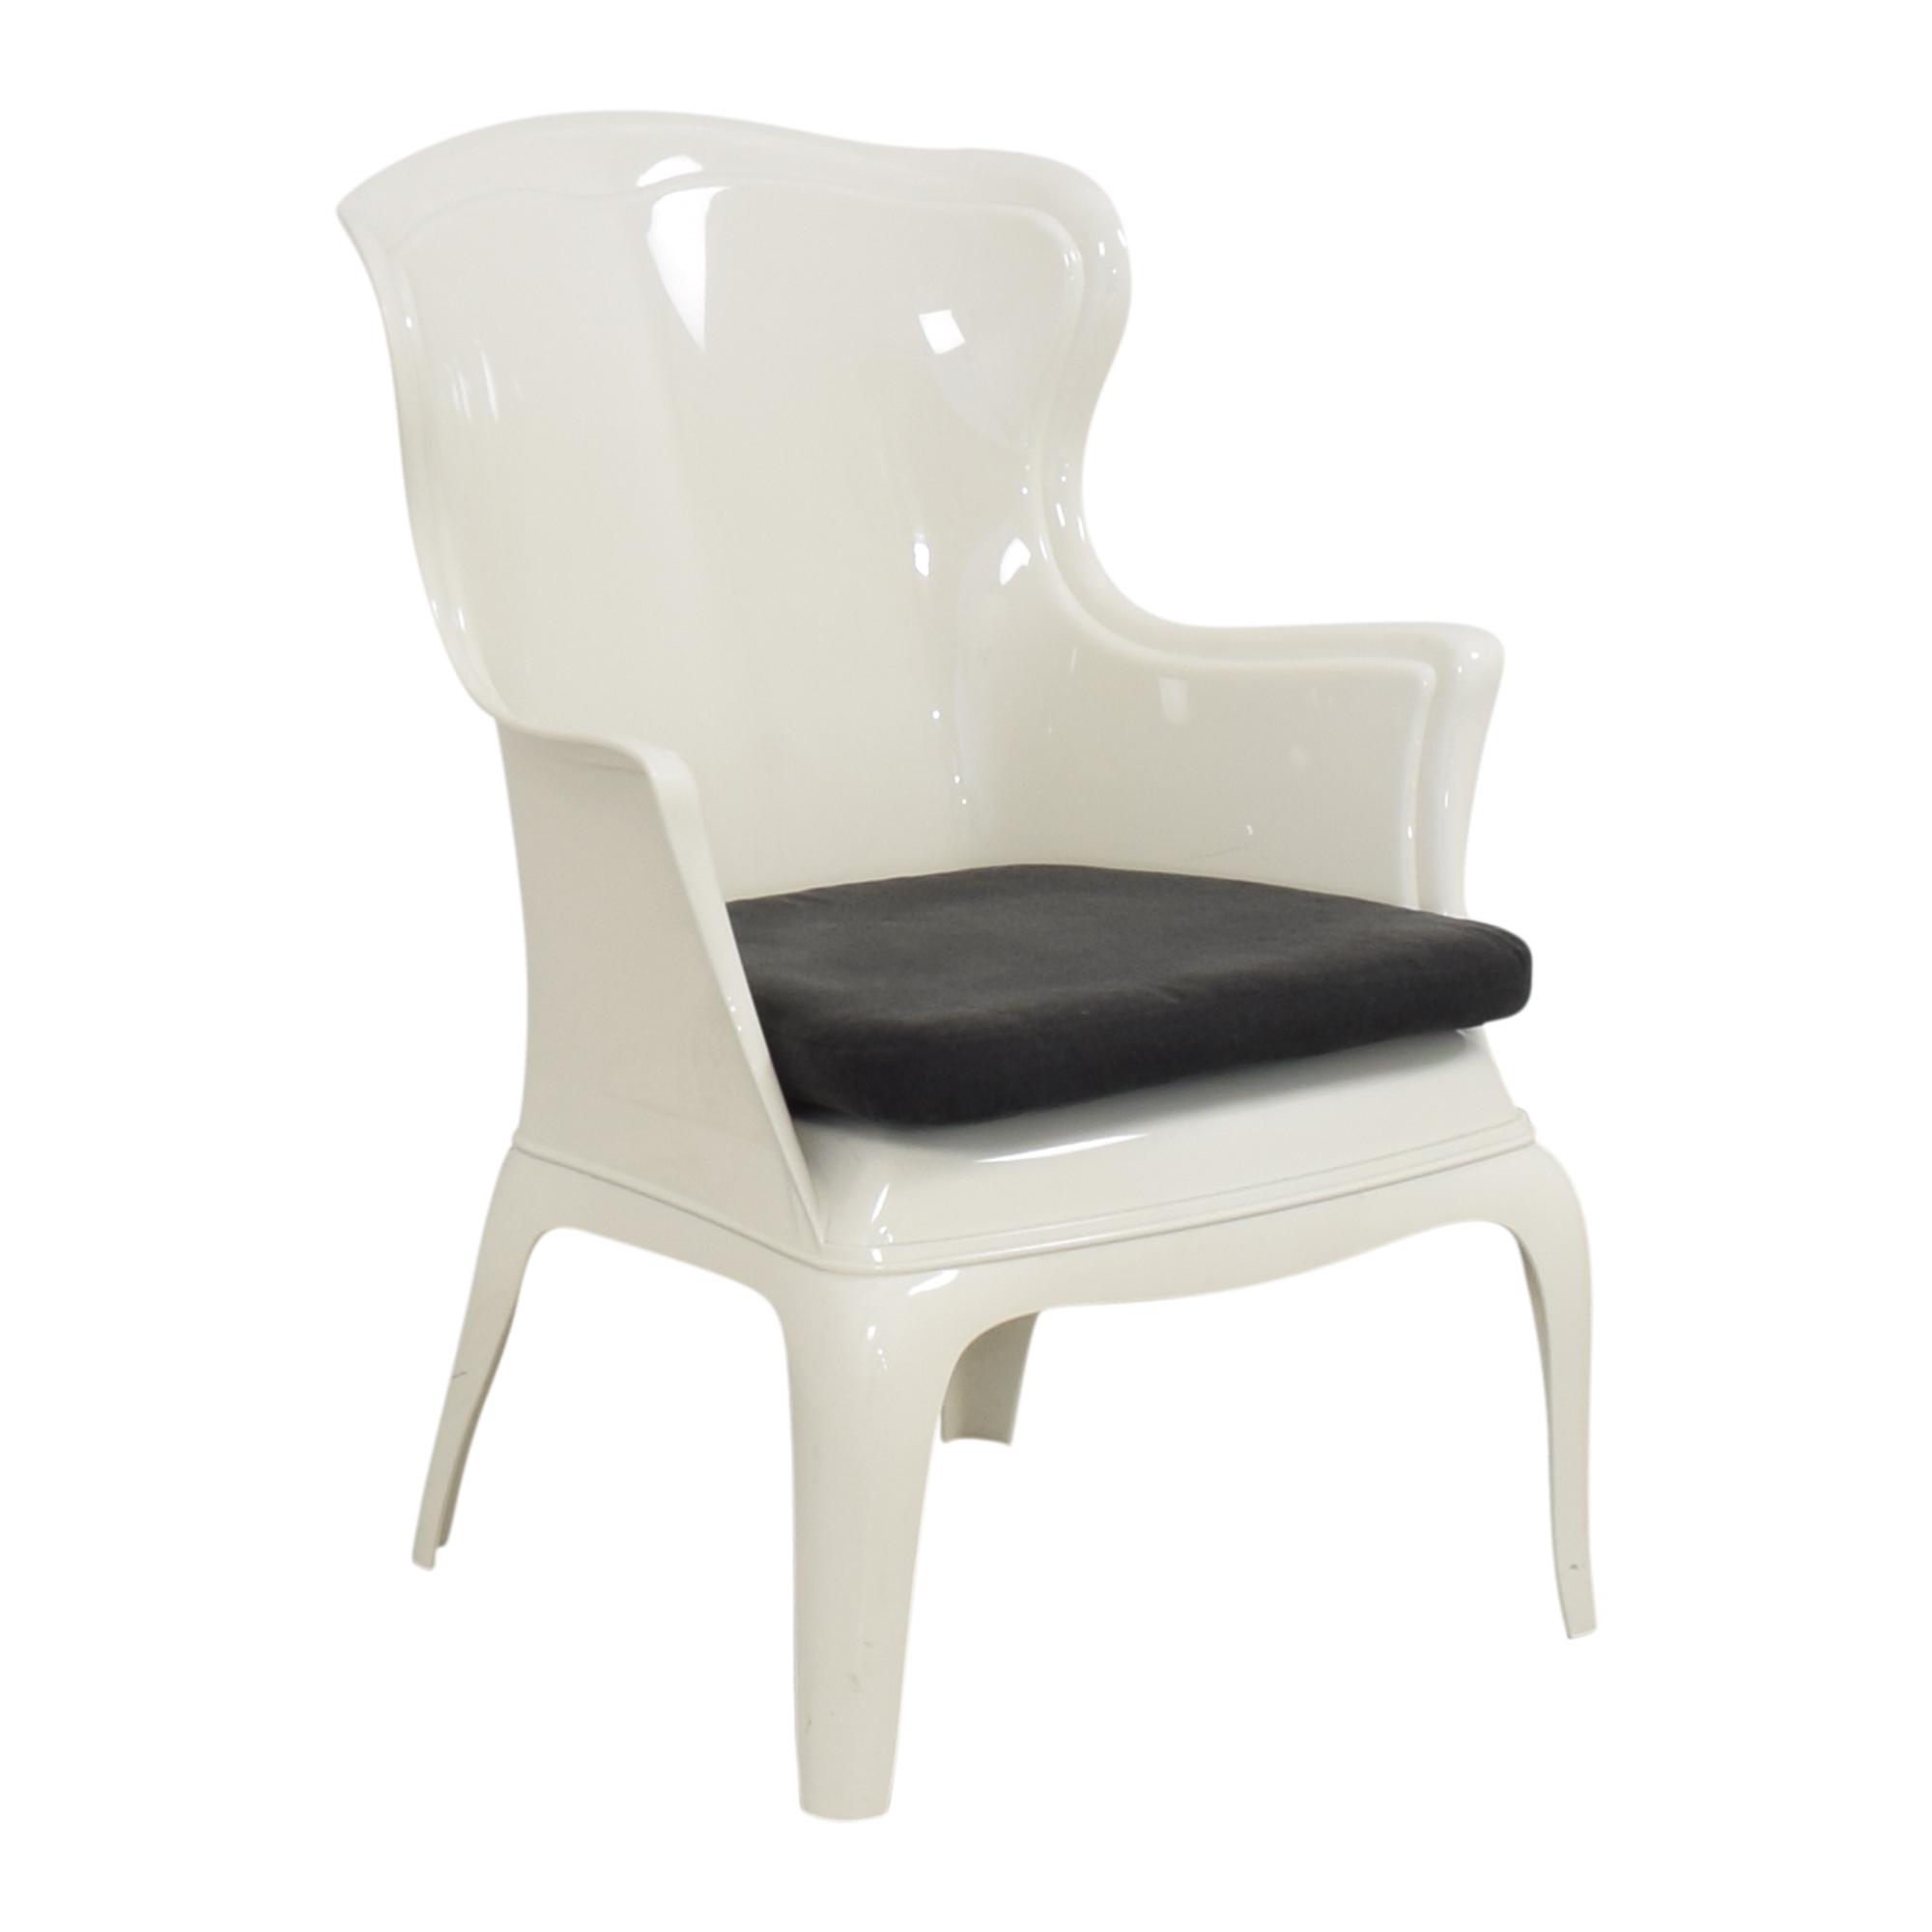 Pedrali Pedrali Pasha Wingback Chair pa